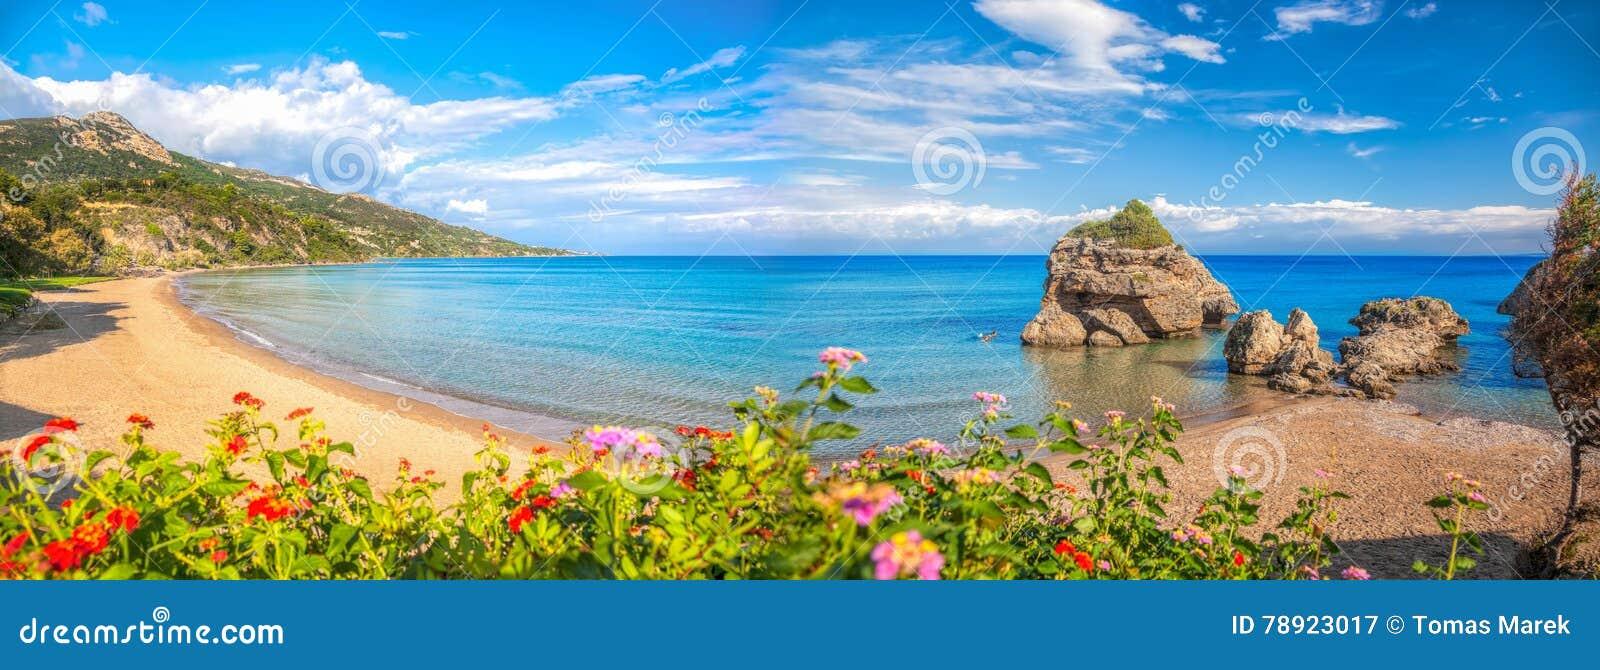 Panorama da praia de Porto Zorro contra flores coloridas na ilha de Zakynthos, Grécia